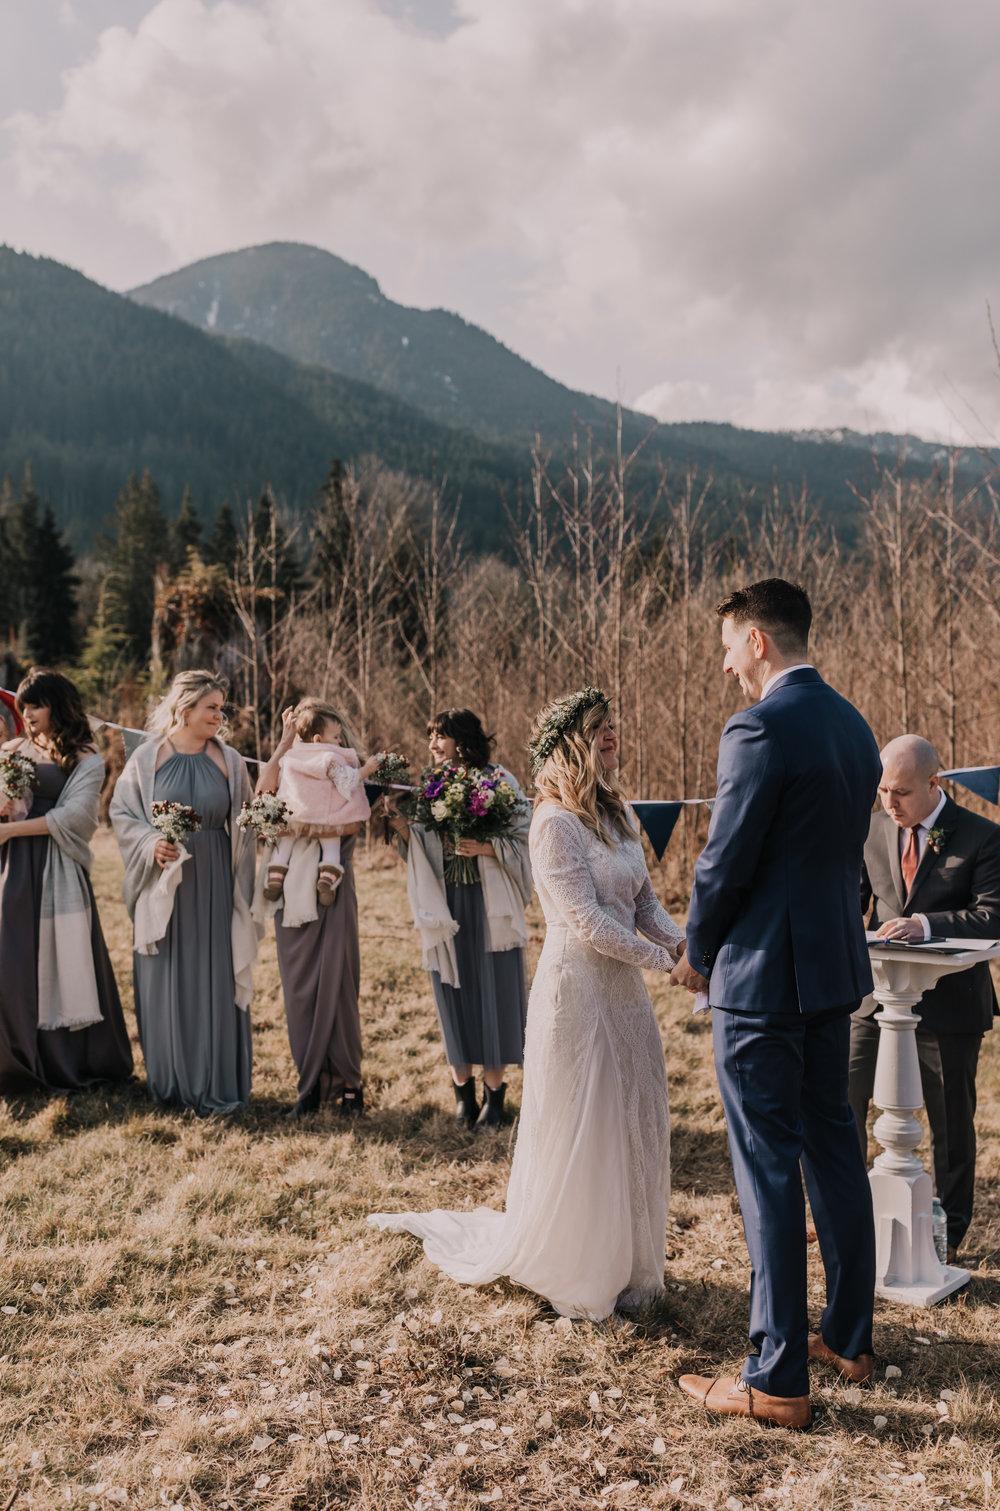 Sunshine Coast Wedding Photos - Mountain Wedding Photos - Sunshine Coast Wedding Photographer - Vancouver Wedding Photographer - Jennifer Picard241-1.JPG